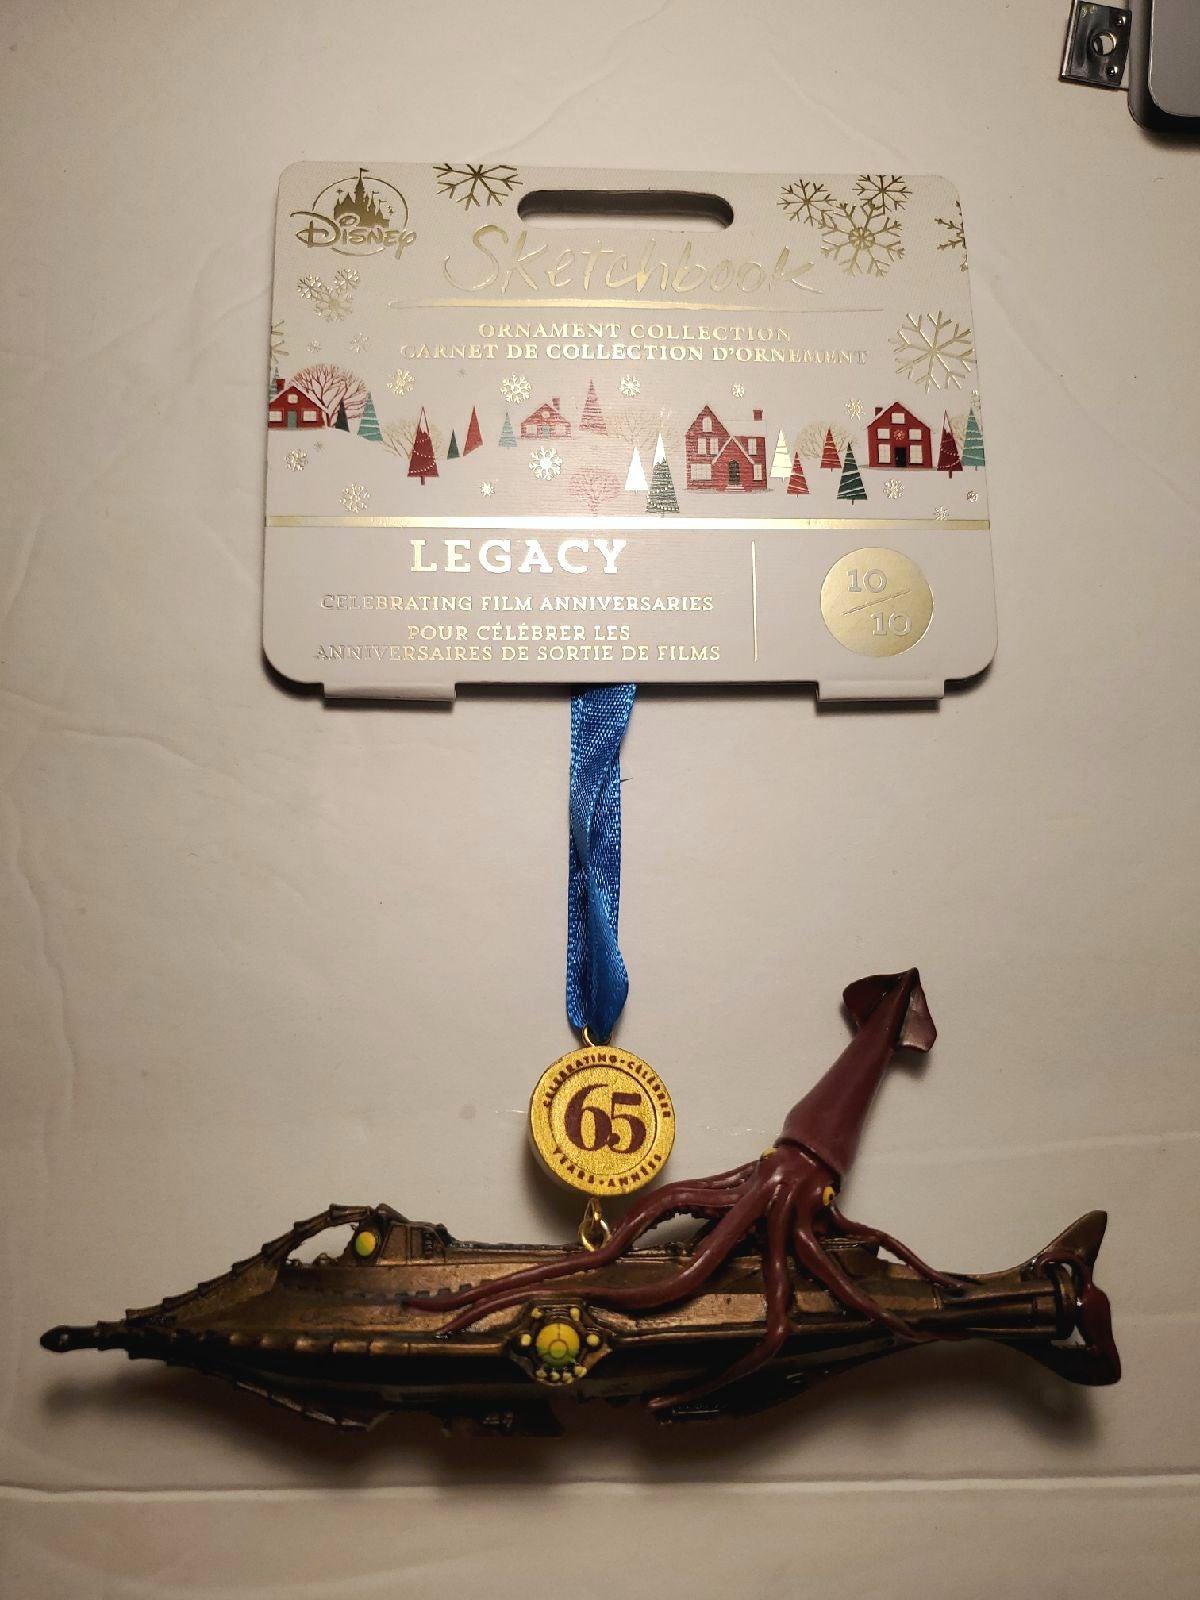 Disney Sketchbook Ornament